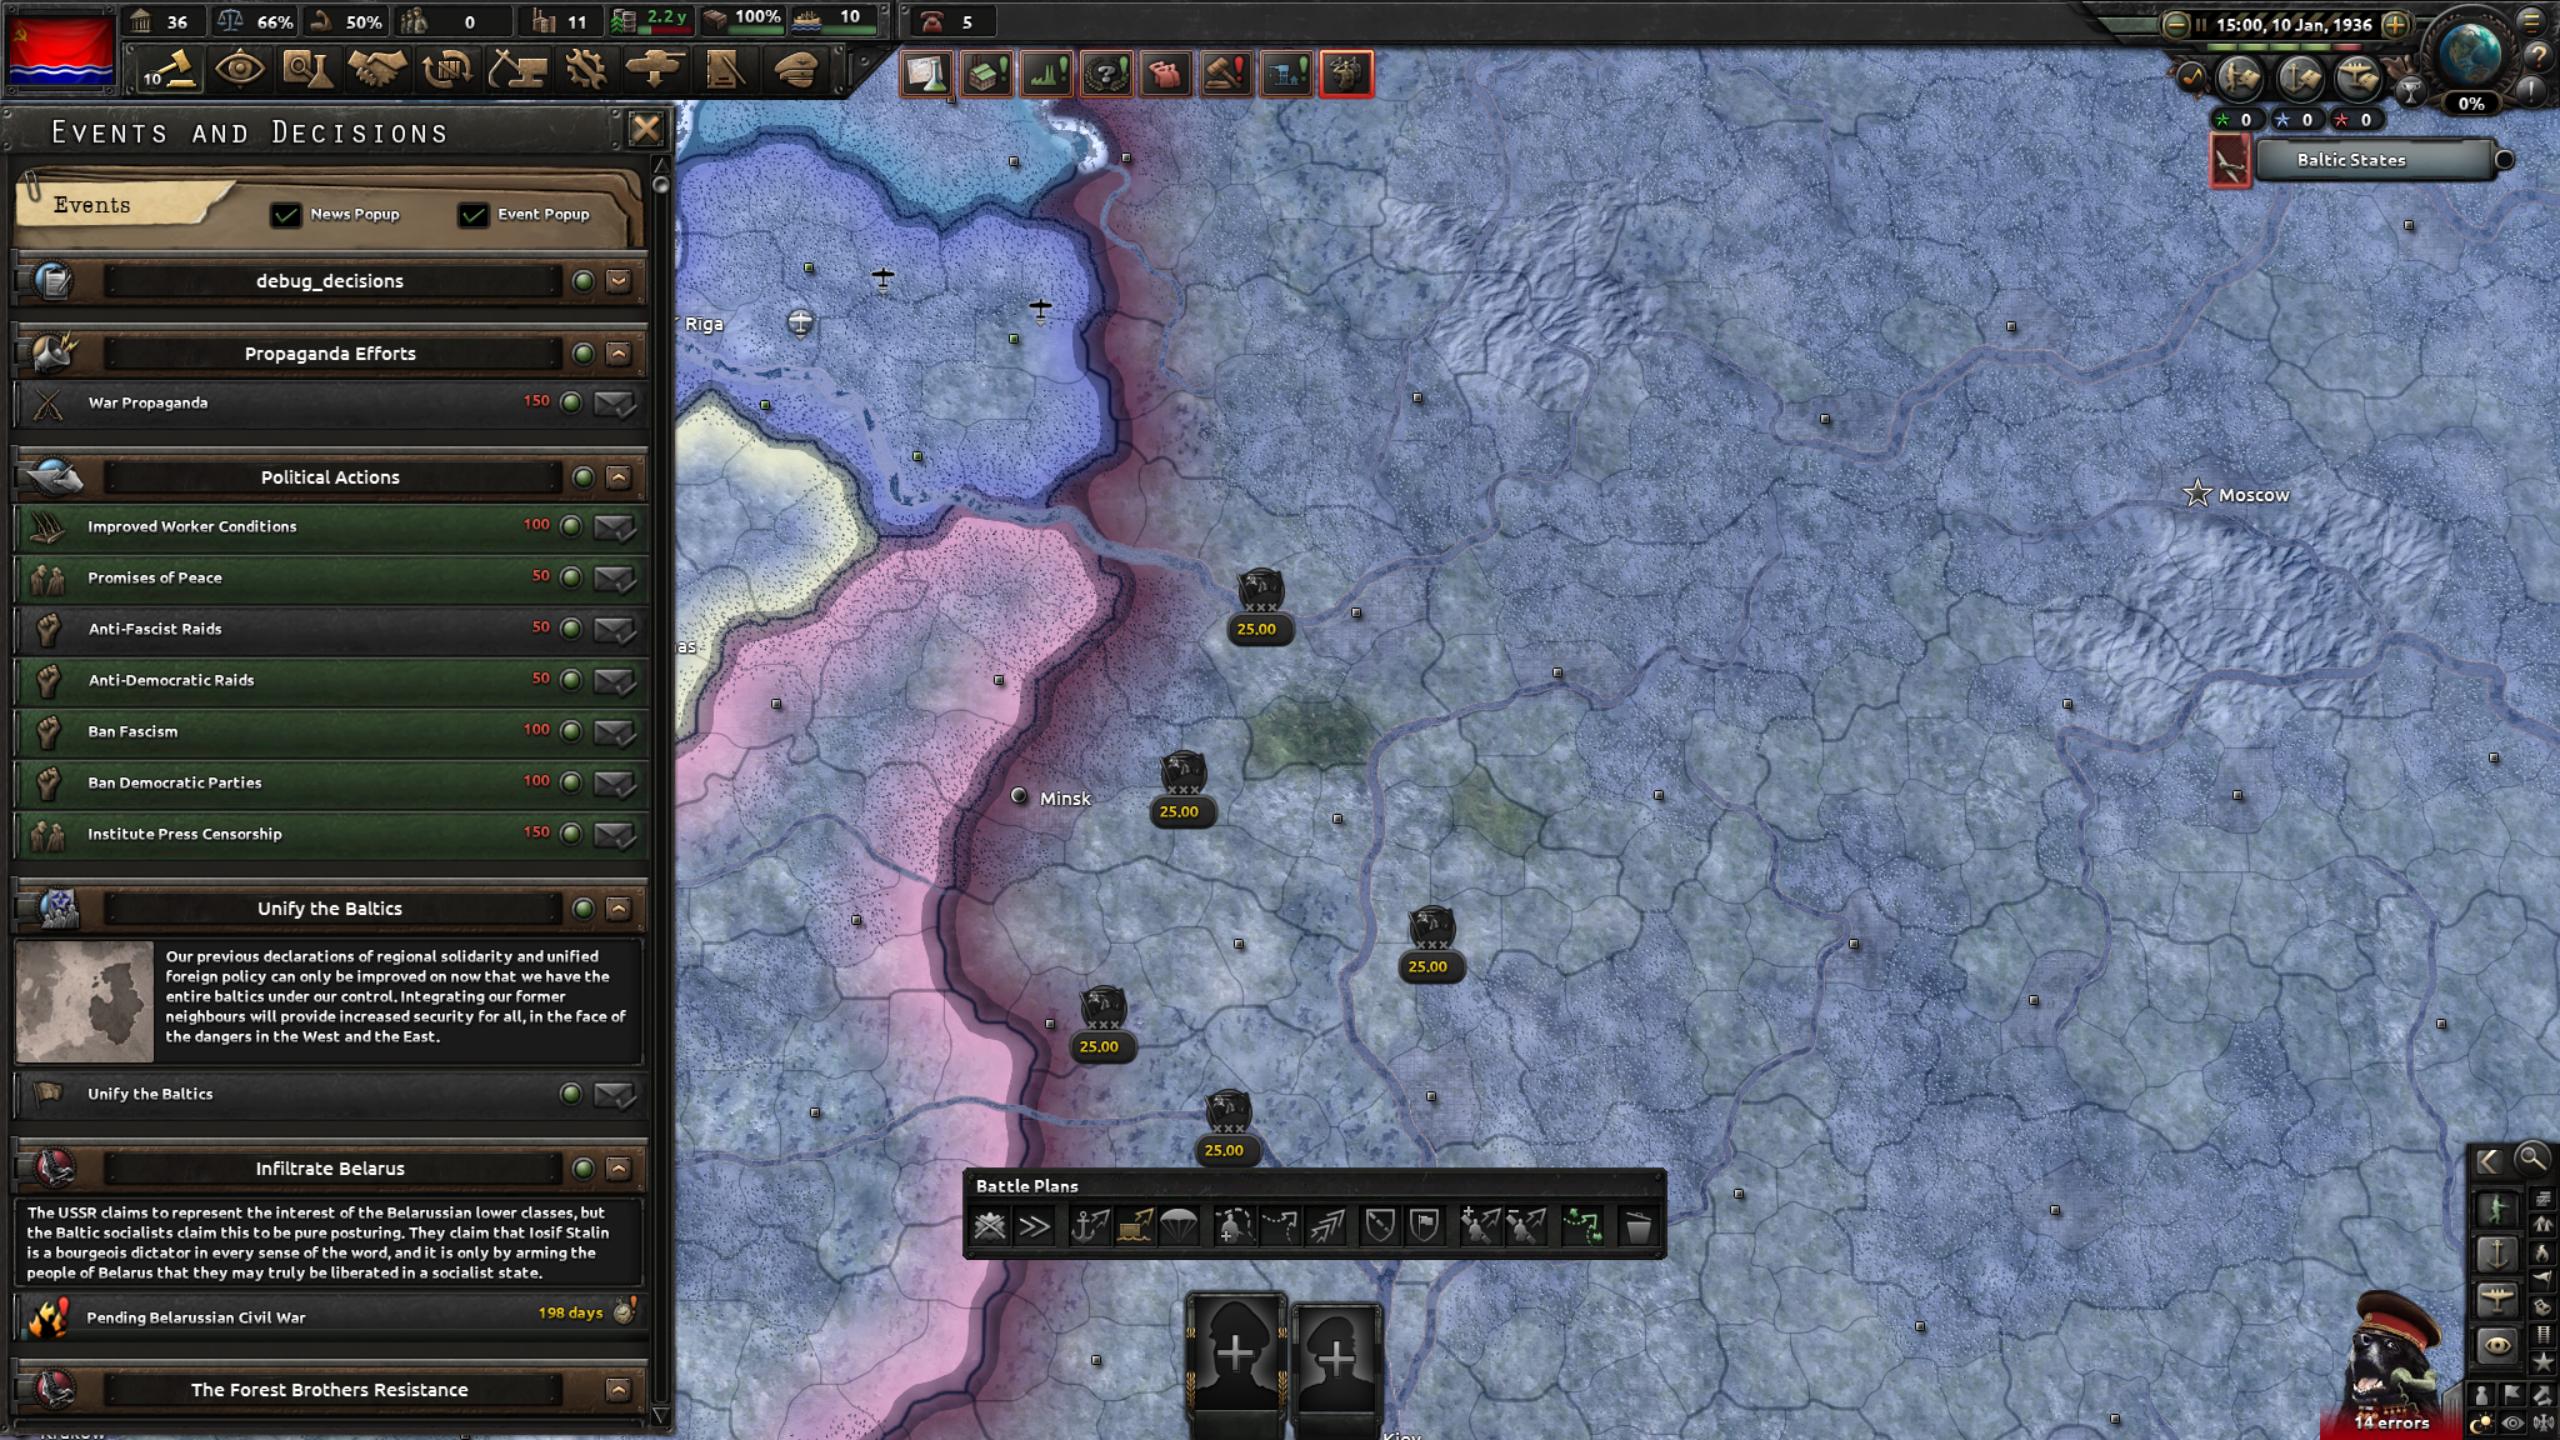 Latvia_Belarus_decisions.png